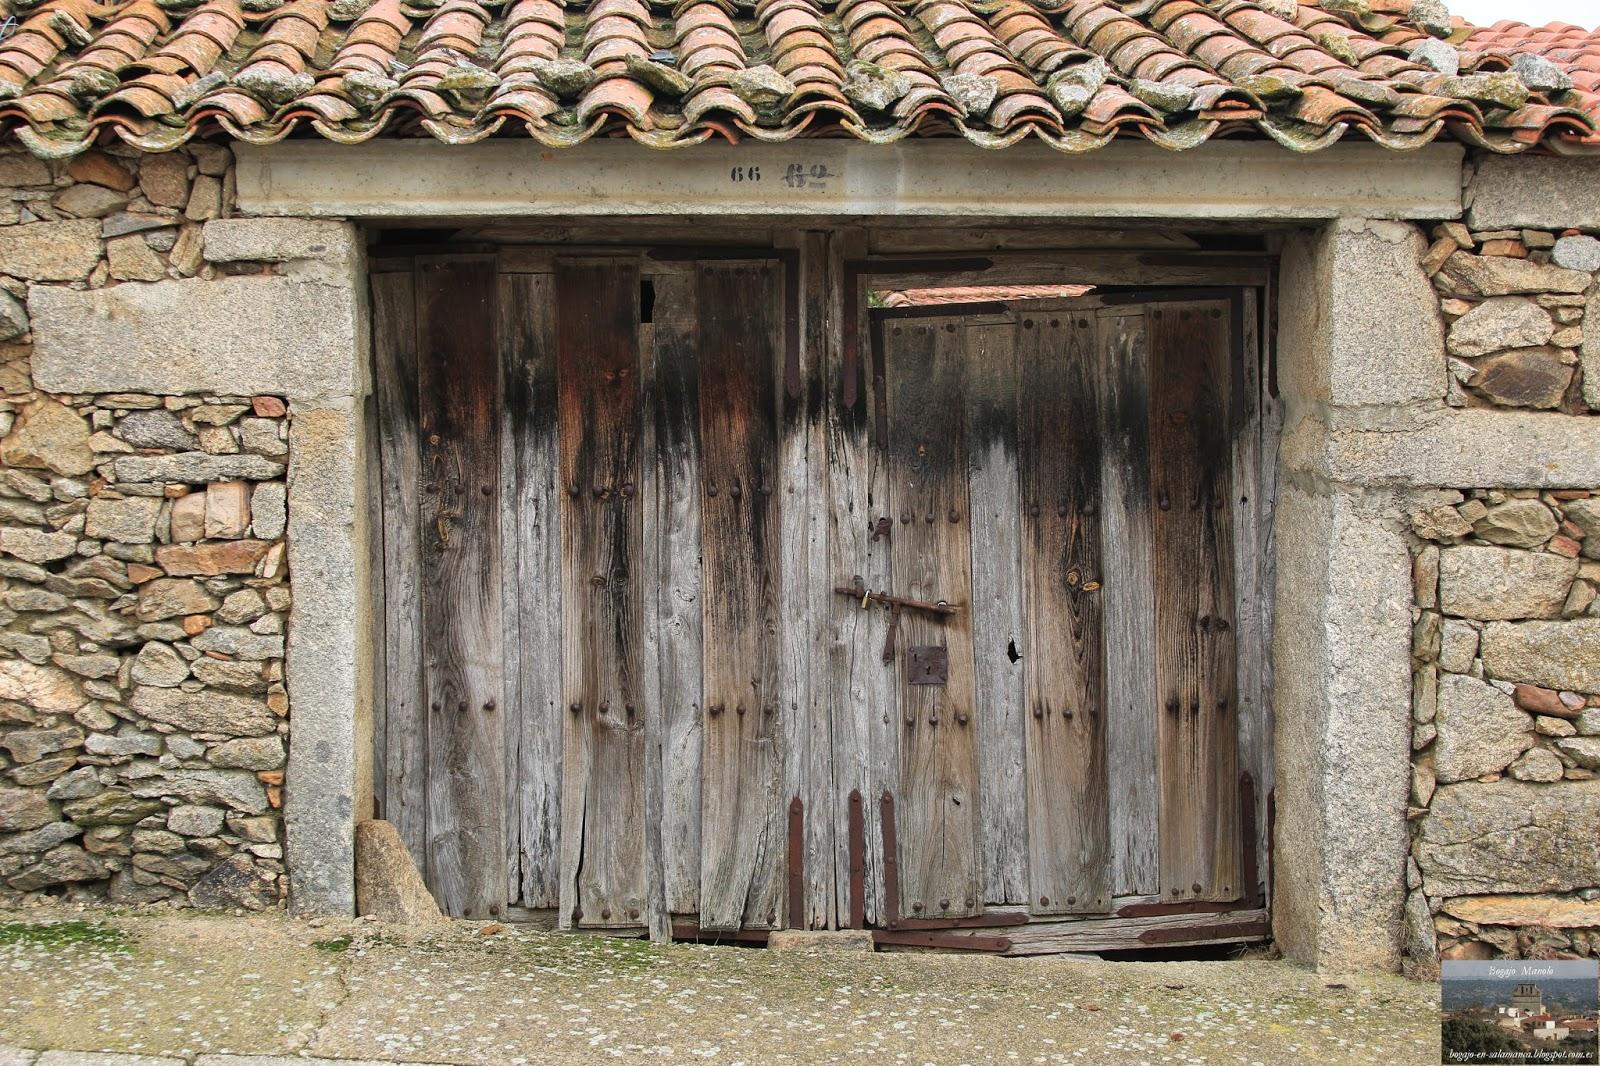 Bogajo salamanca puertas antiguas de doble hoja de madera for Puertas interiores antiguas madera